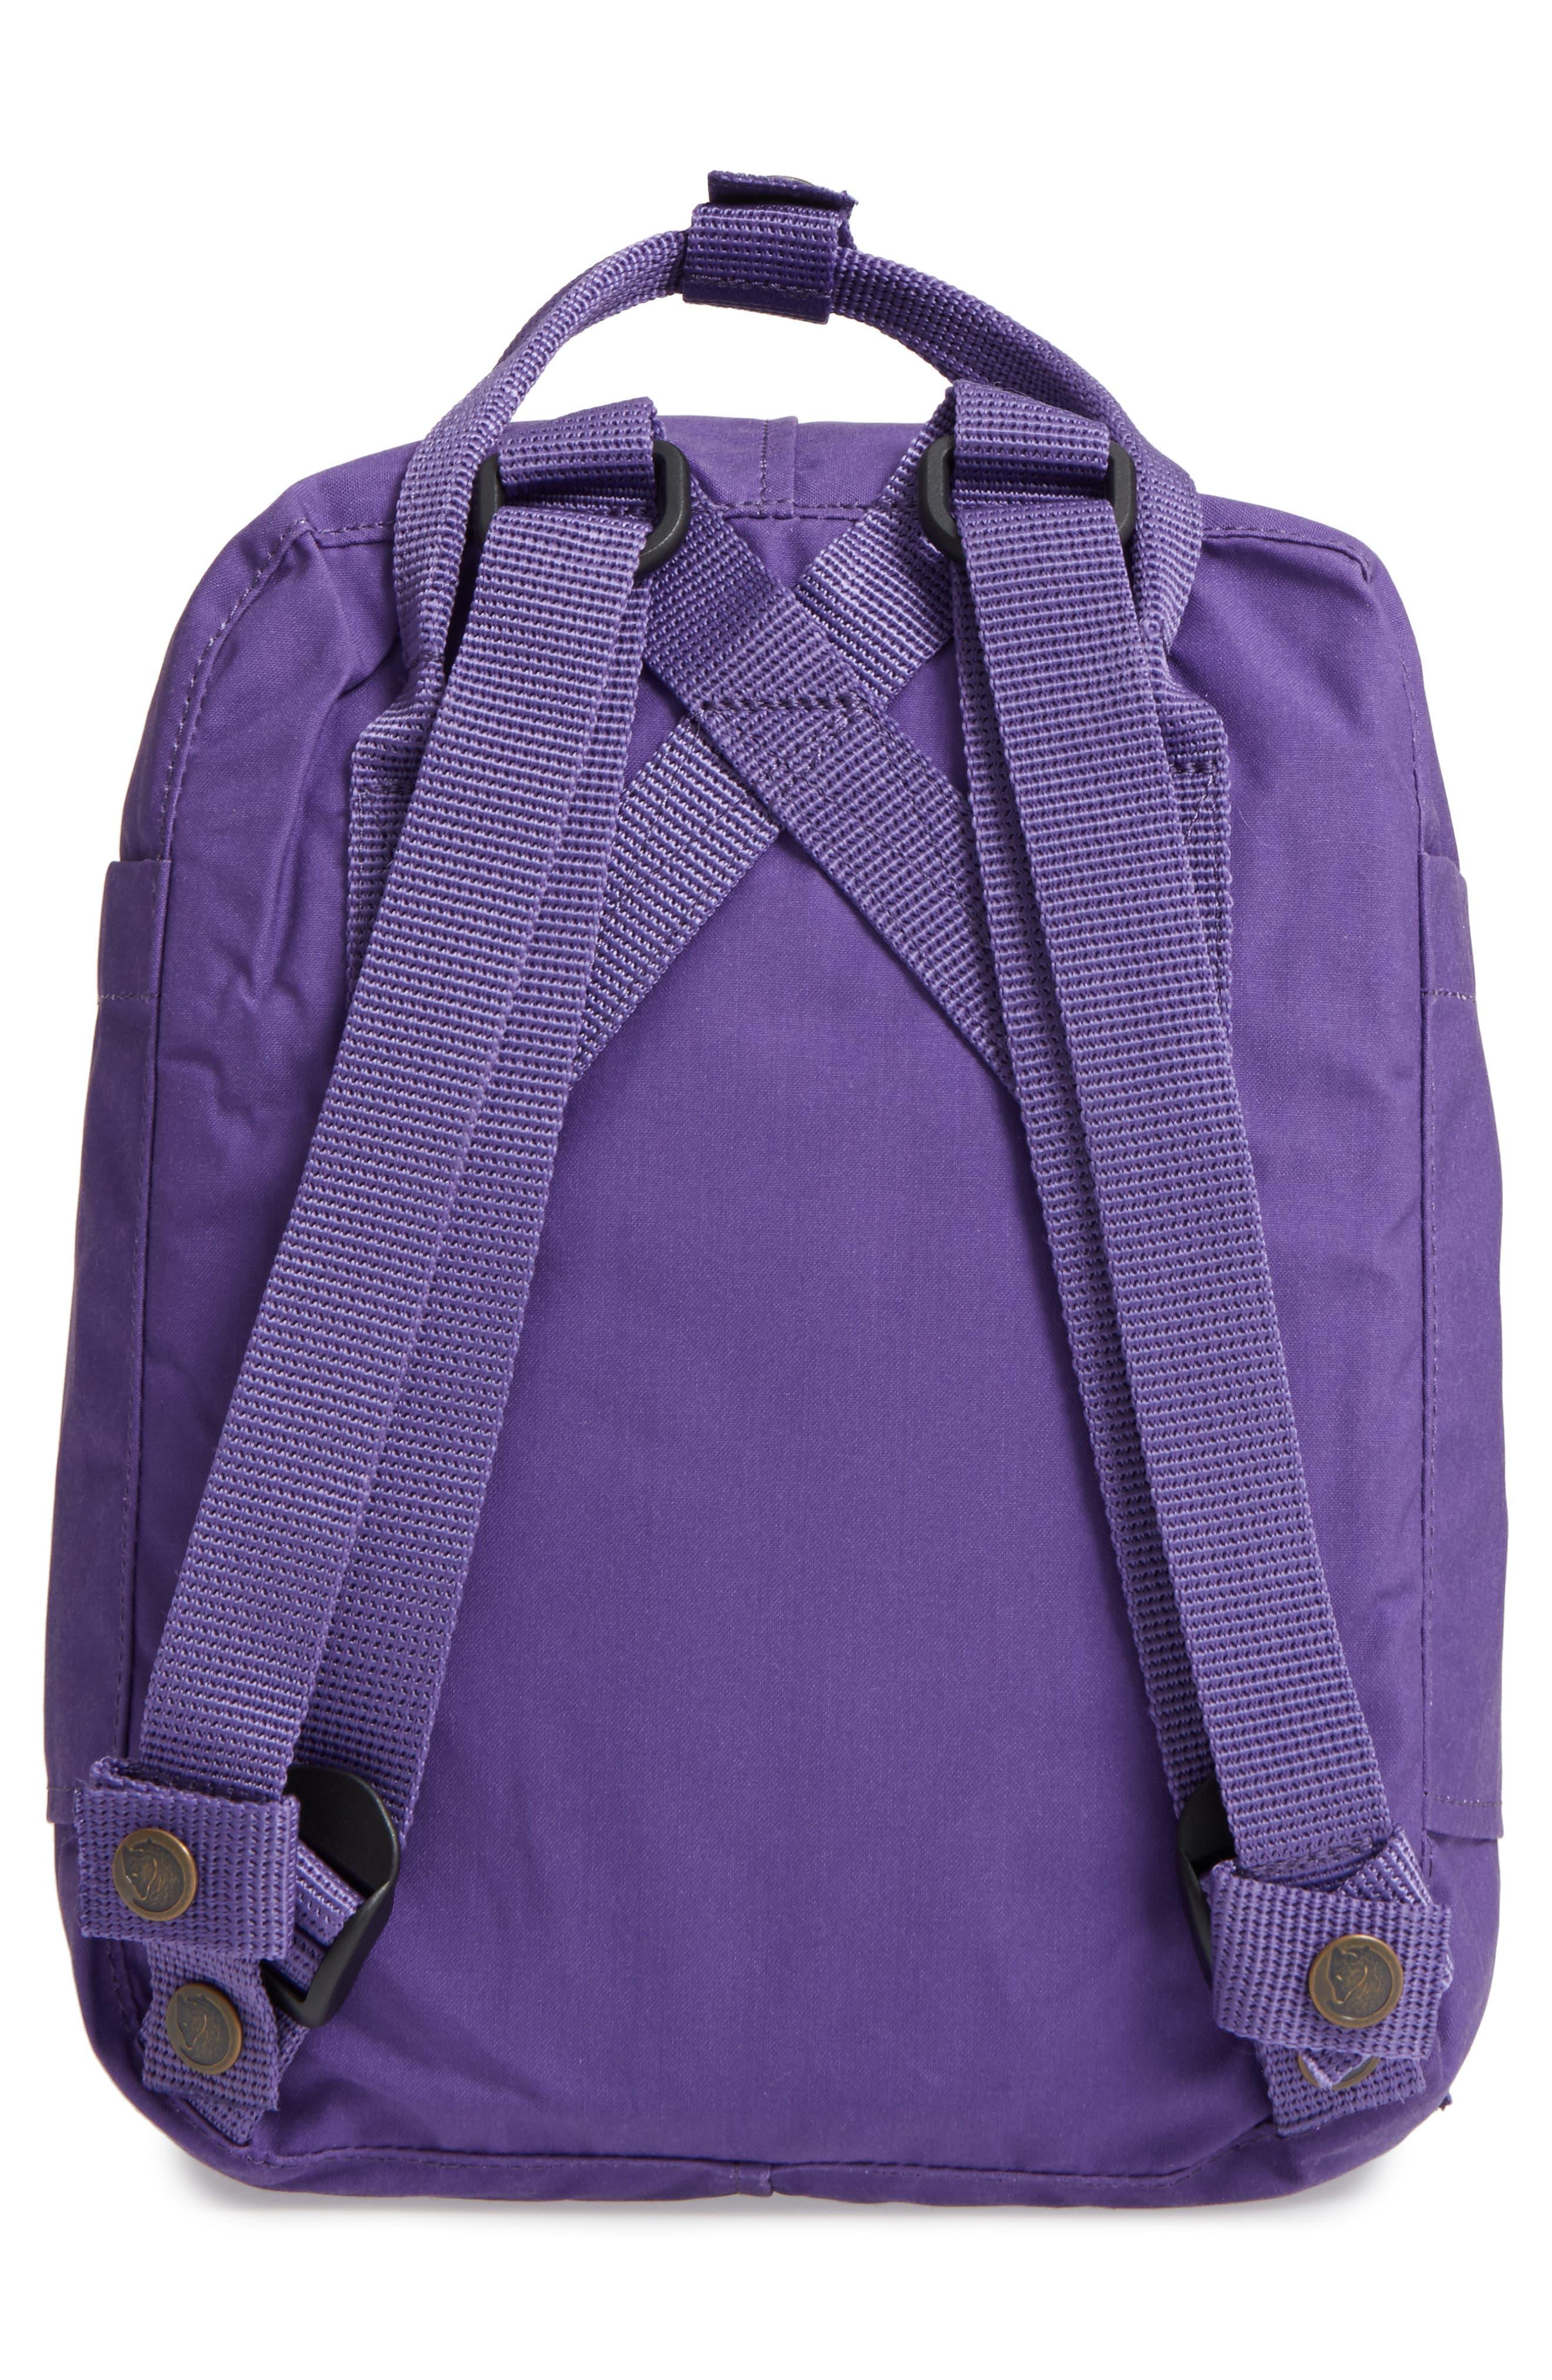 Arctic Fox Mini Kånken Backpack,                             Alternate thumbnail 2, color,                             Purple/Orchid